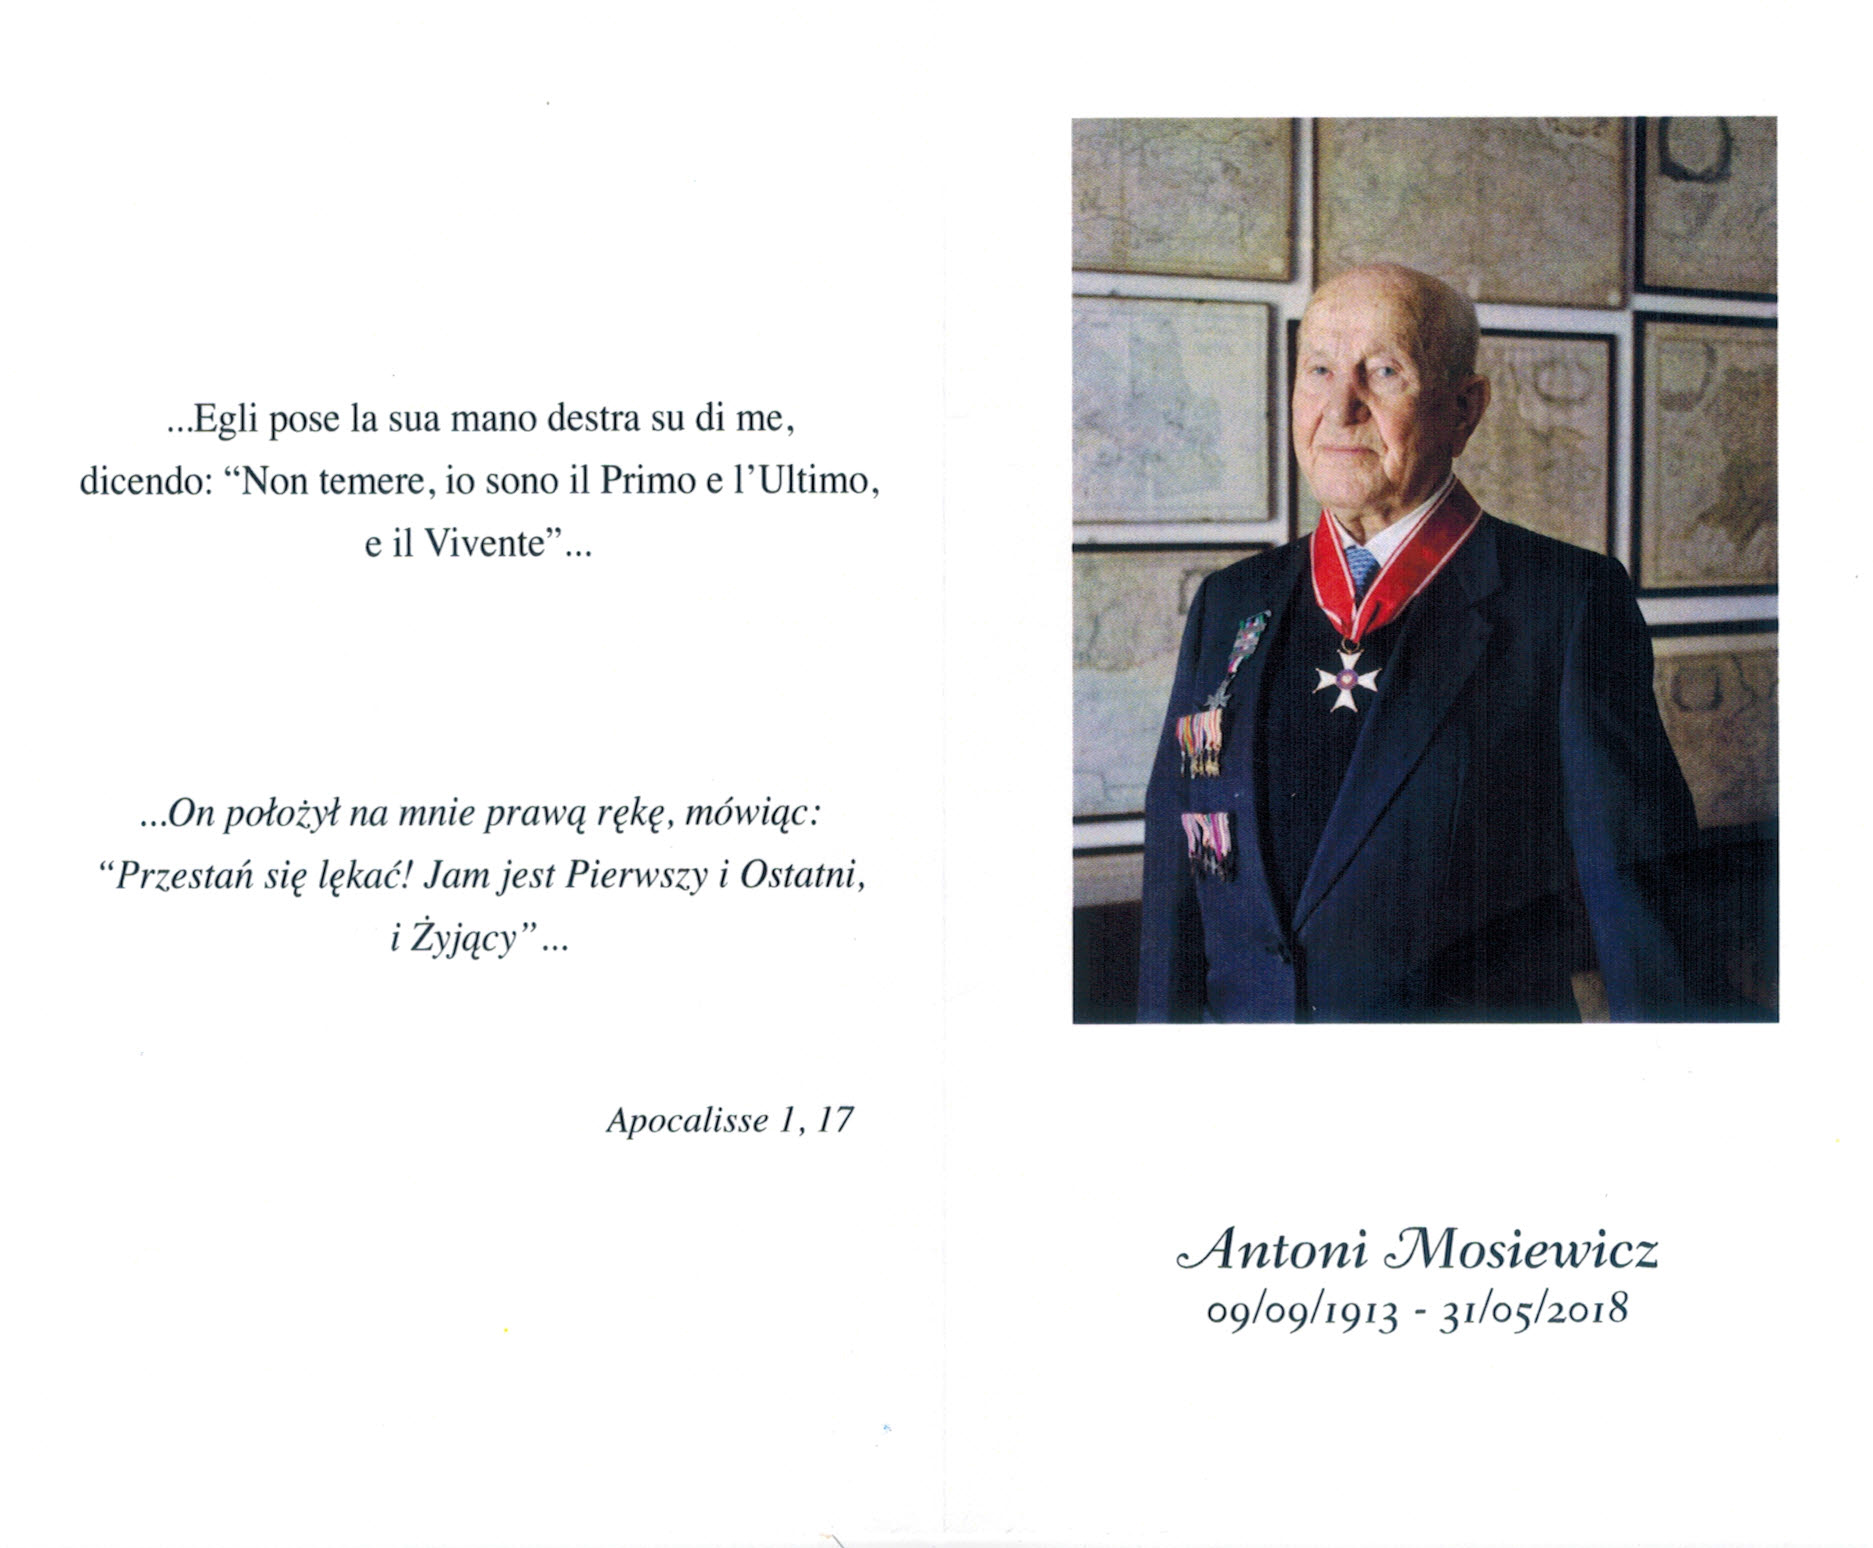 AntoniMosiewicz